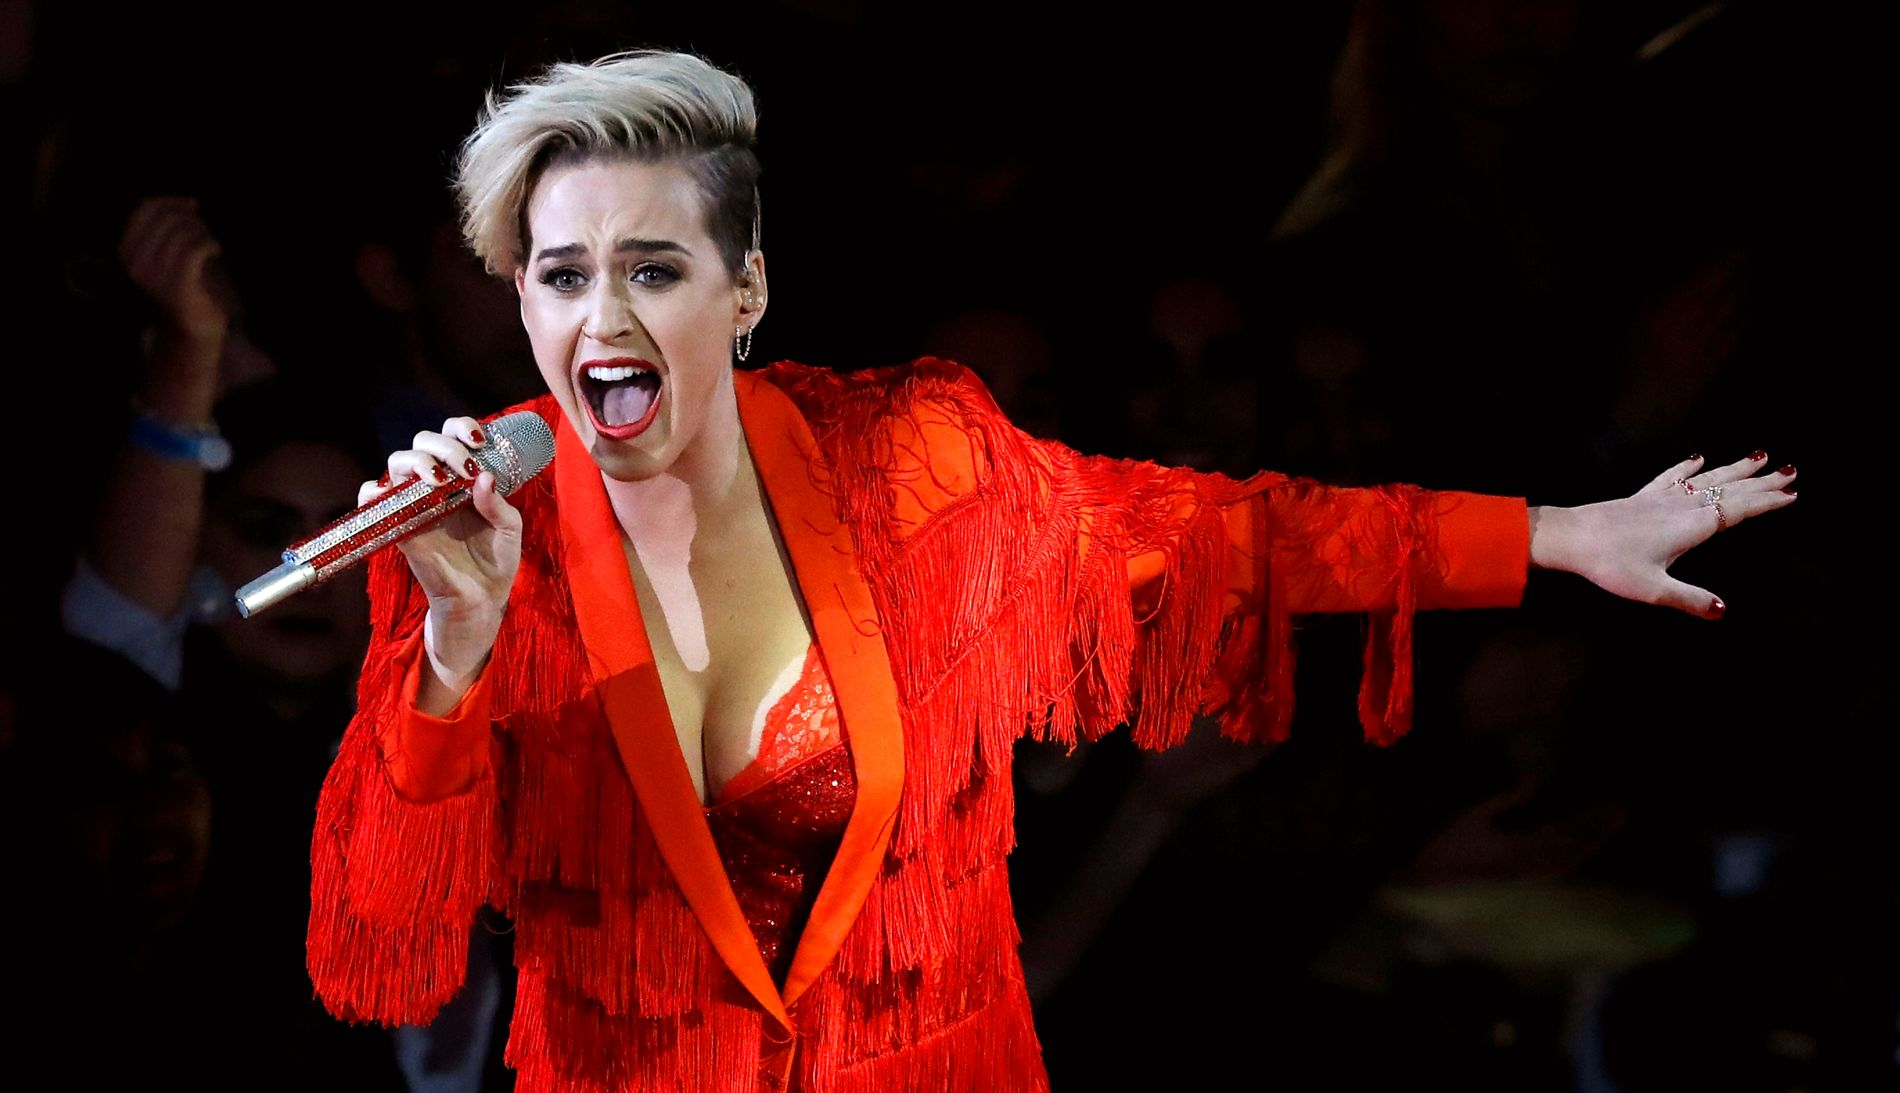 AVVISER VOLDTEKTSRYKTER: Katy Perry.